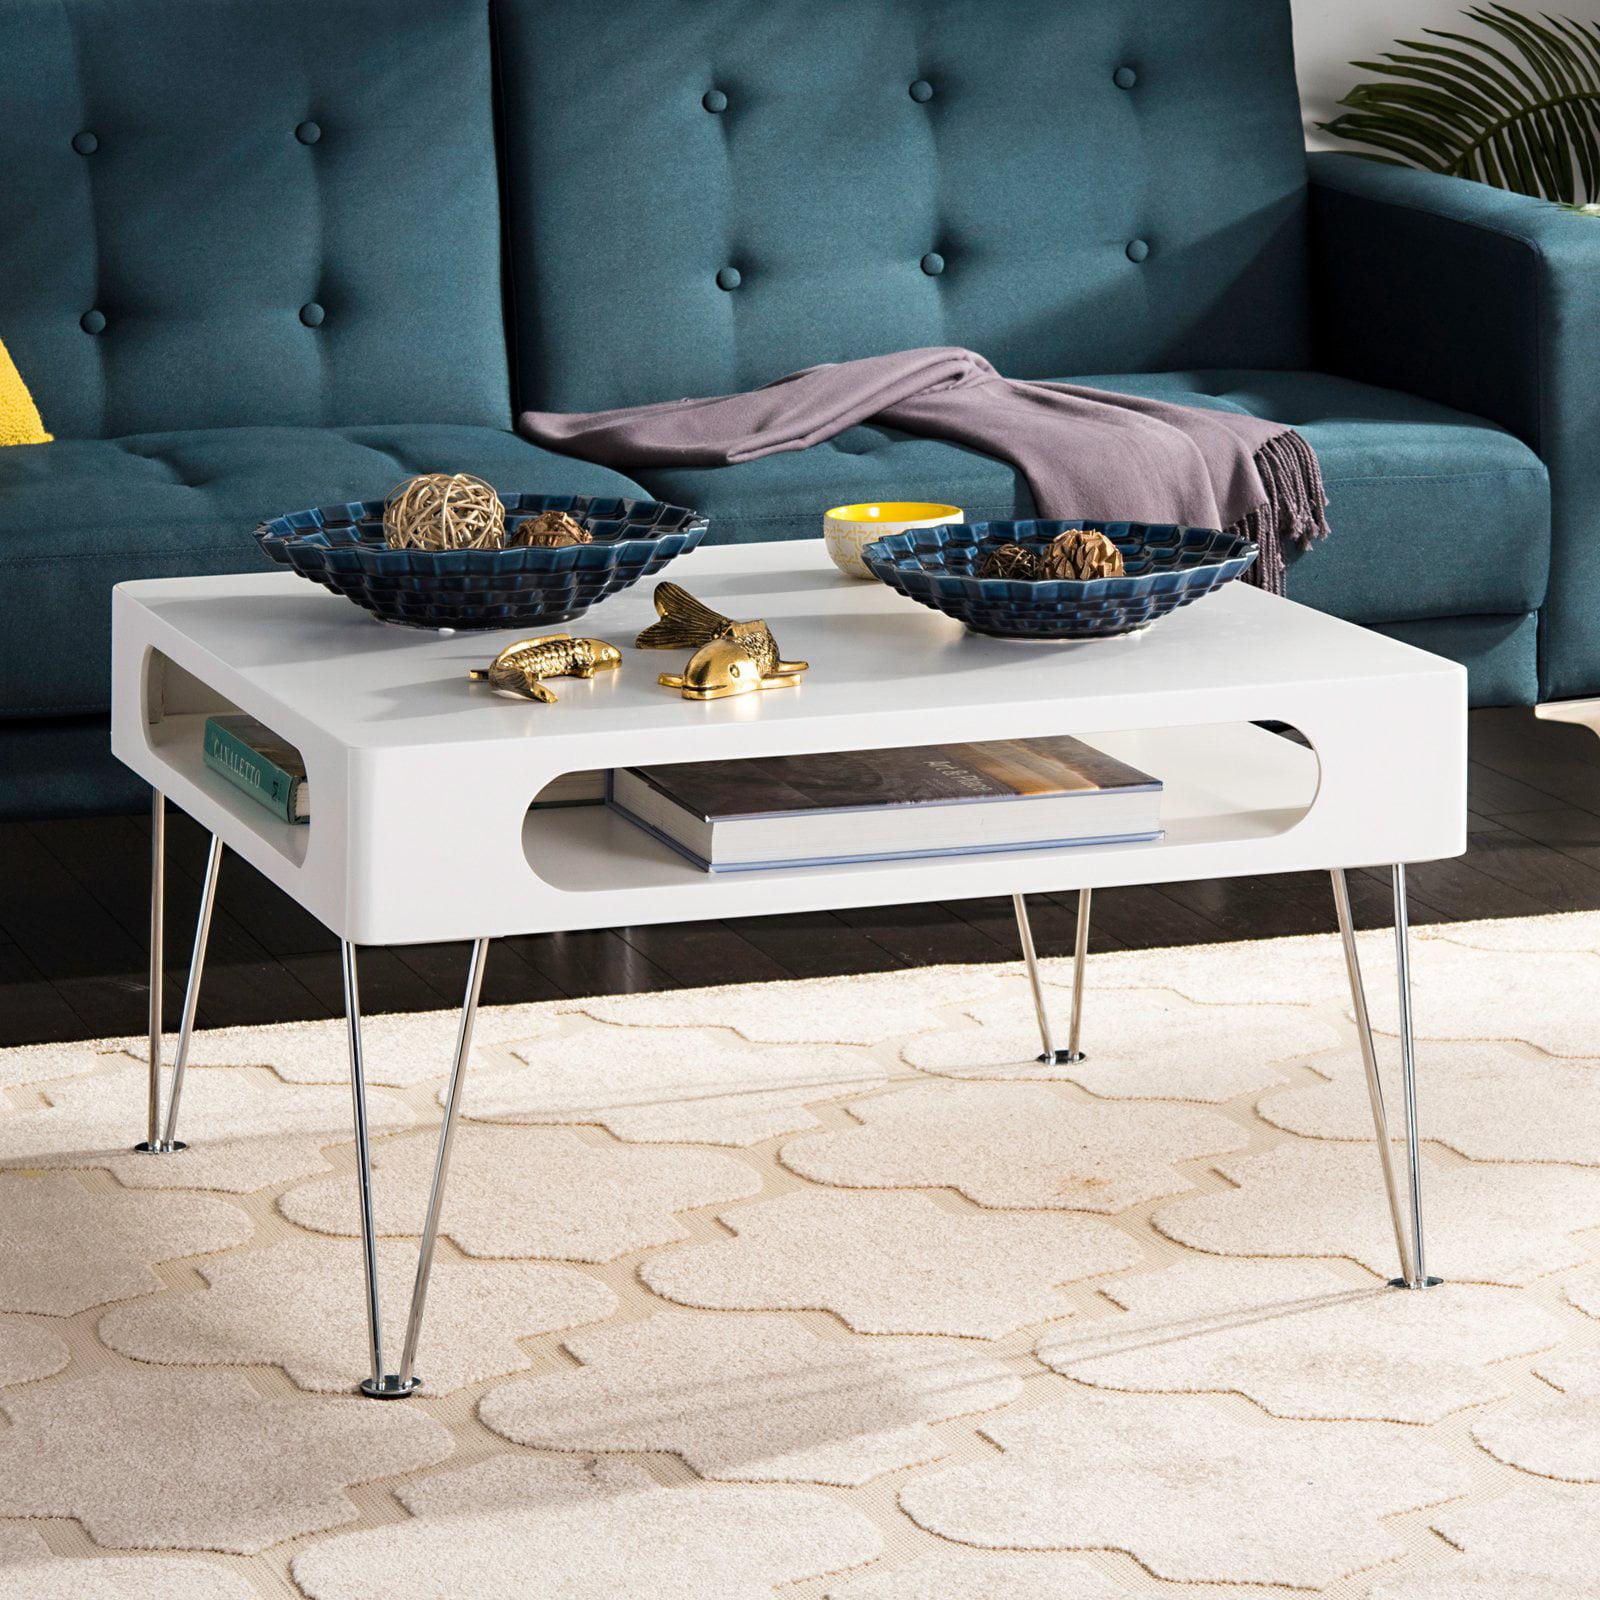 Safavieh Keaton Coffee Table, White with Chrome Legs